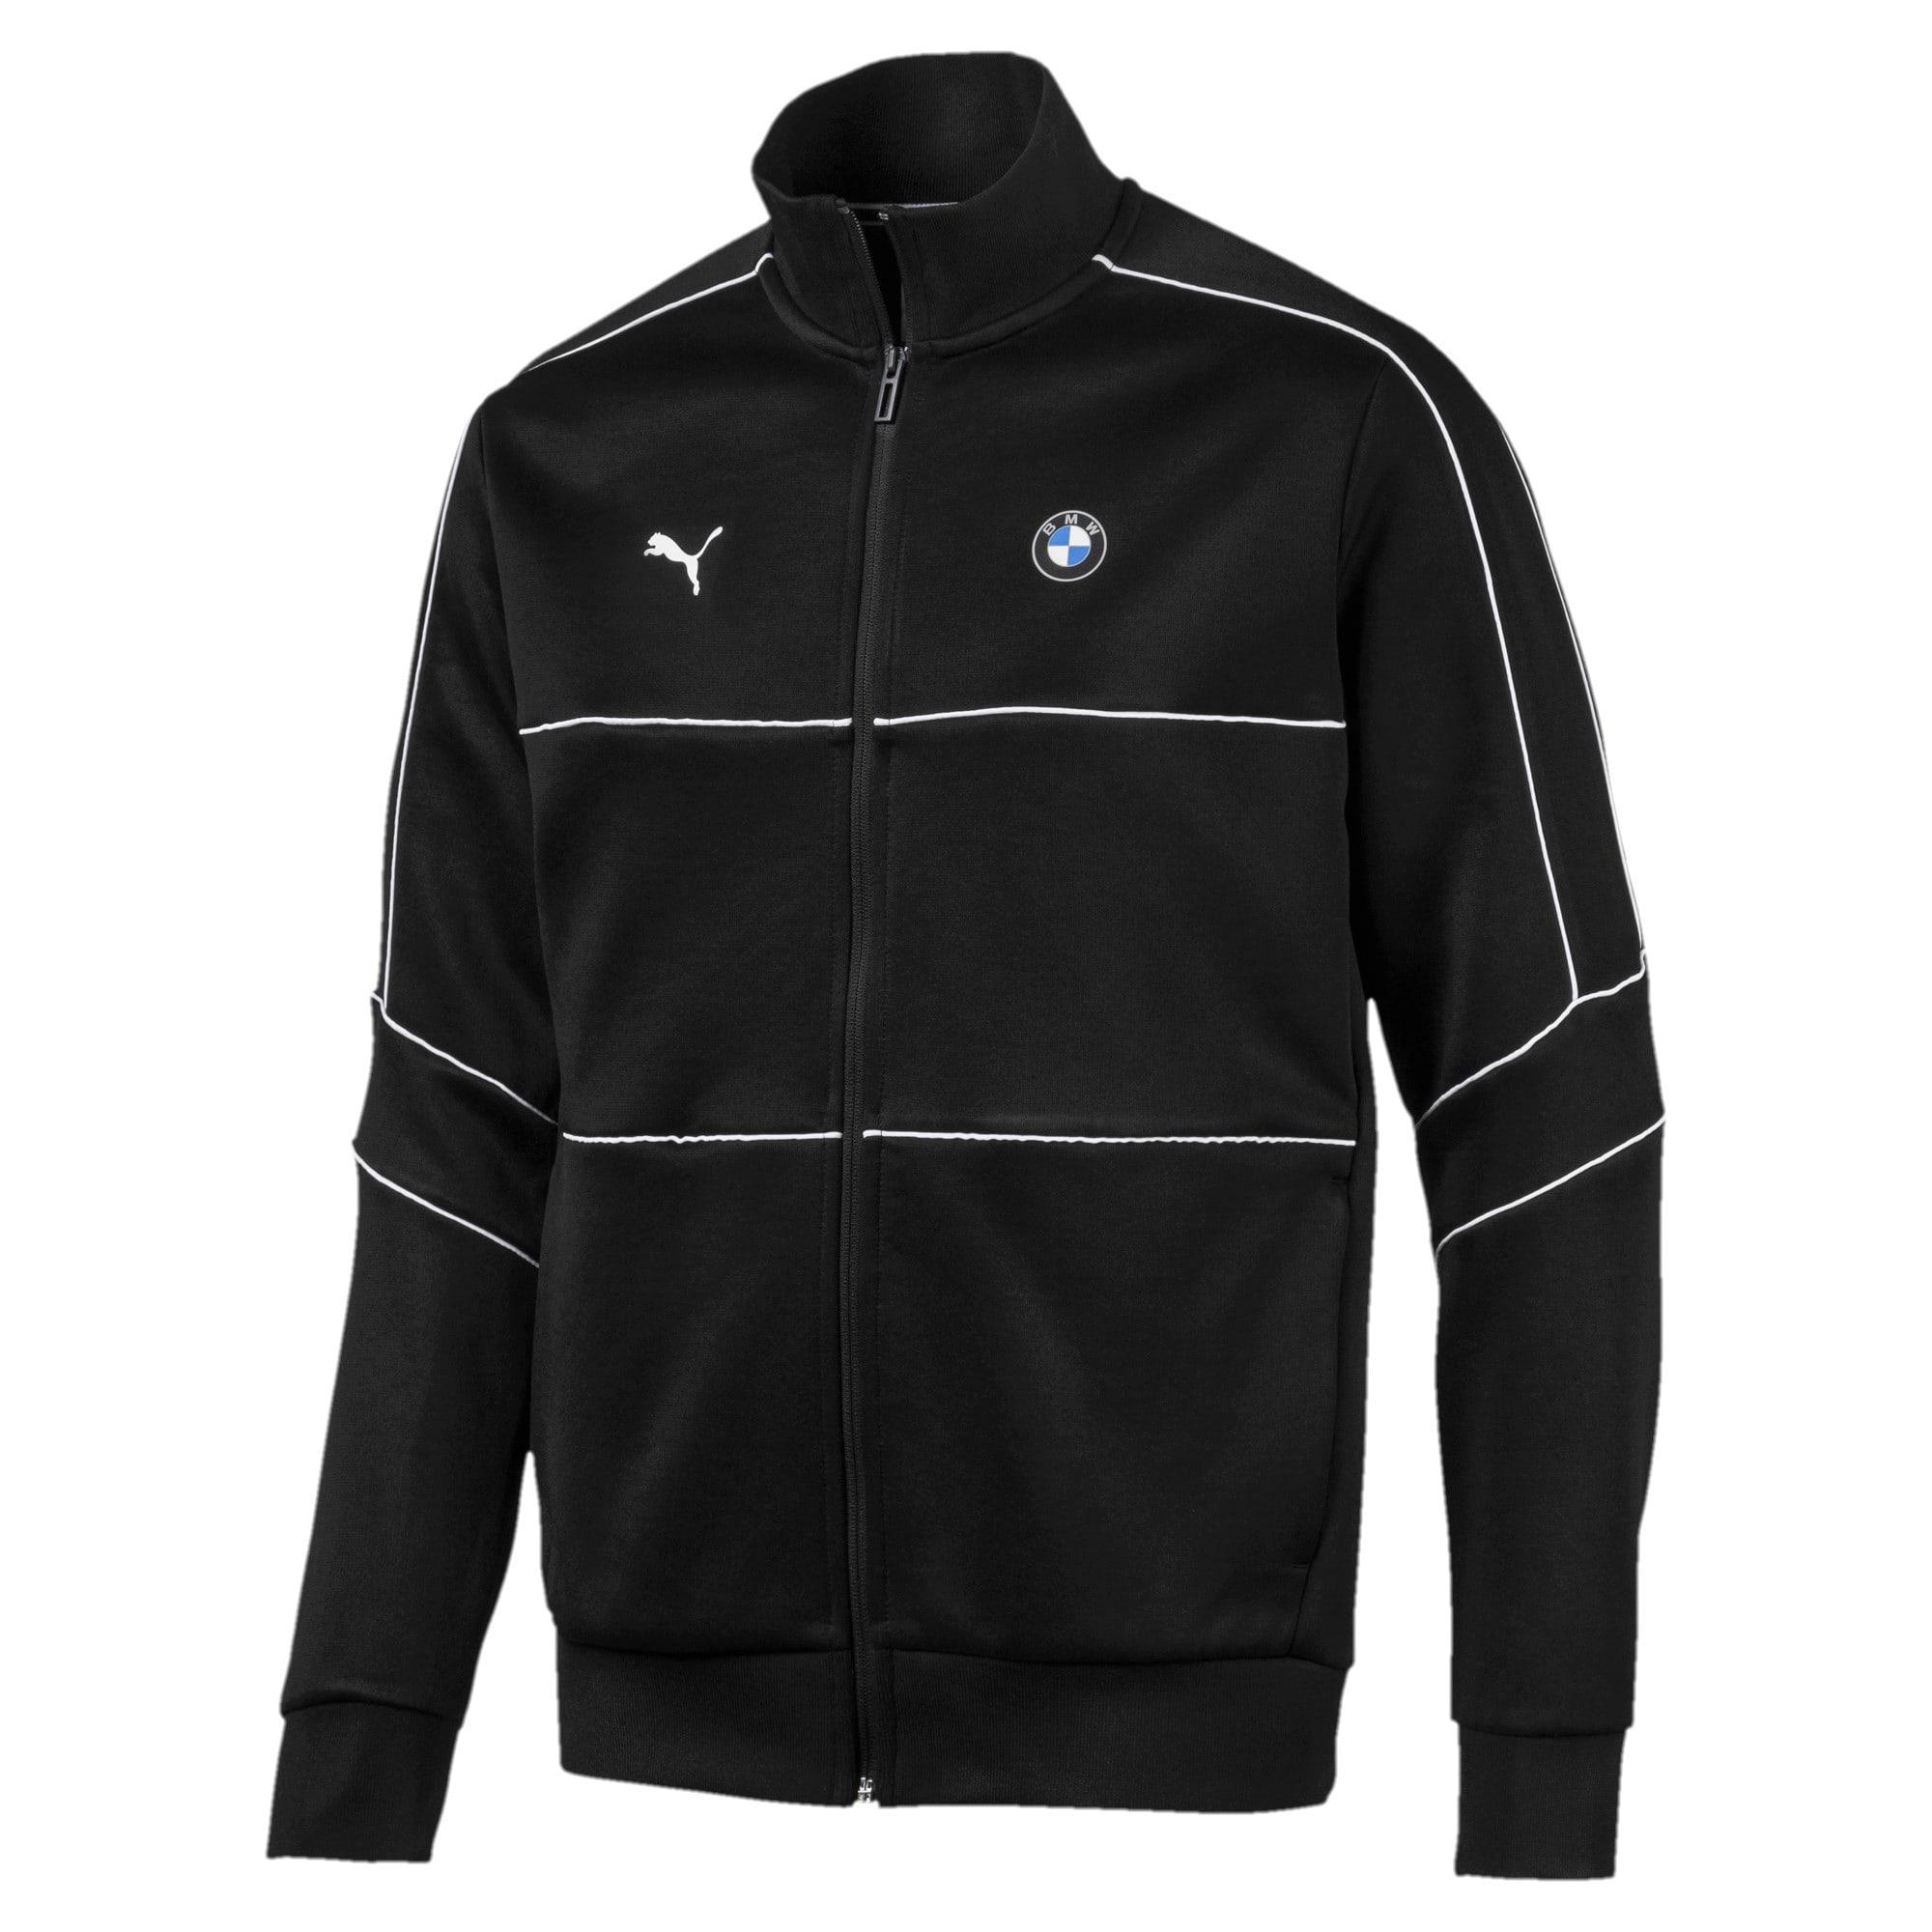 Thumbnail 1 of BMW M Motorsport Men's T7 Track Jacket, Puma Black, medium